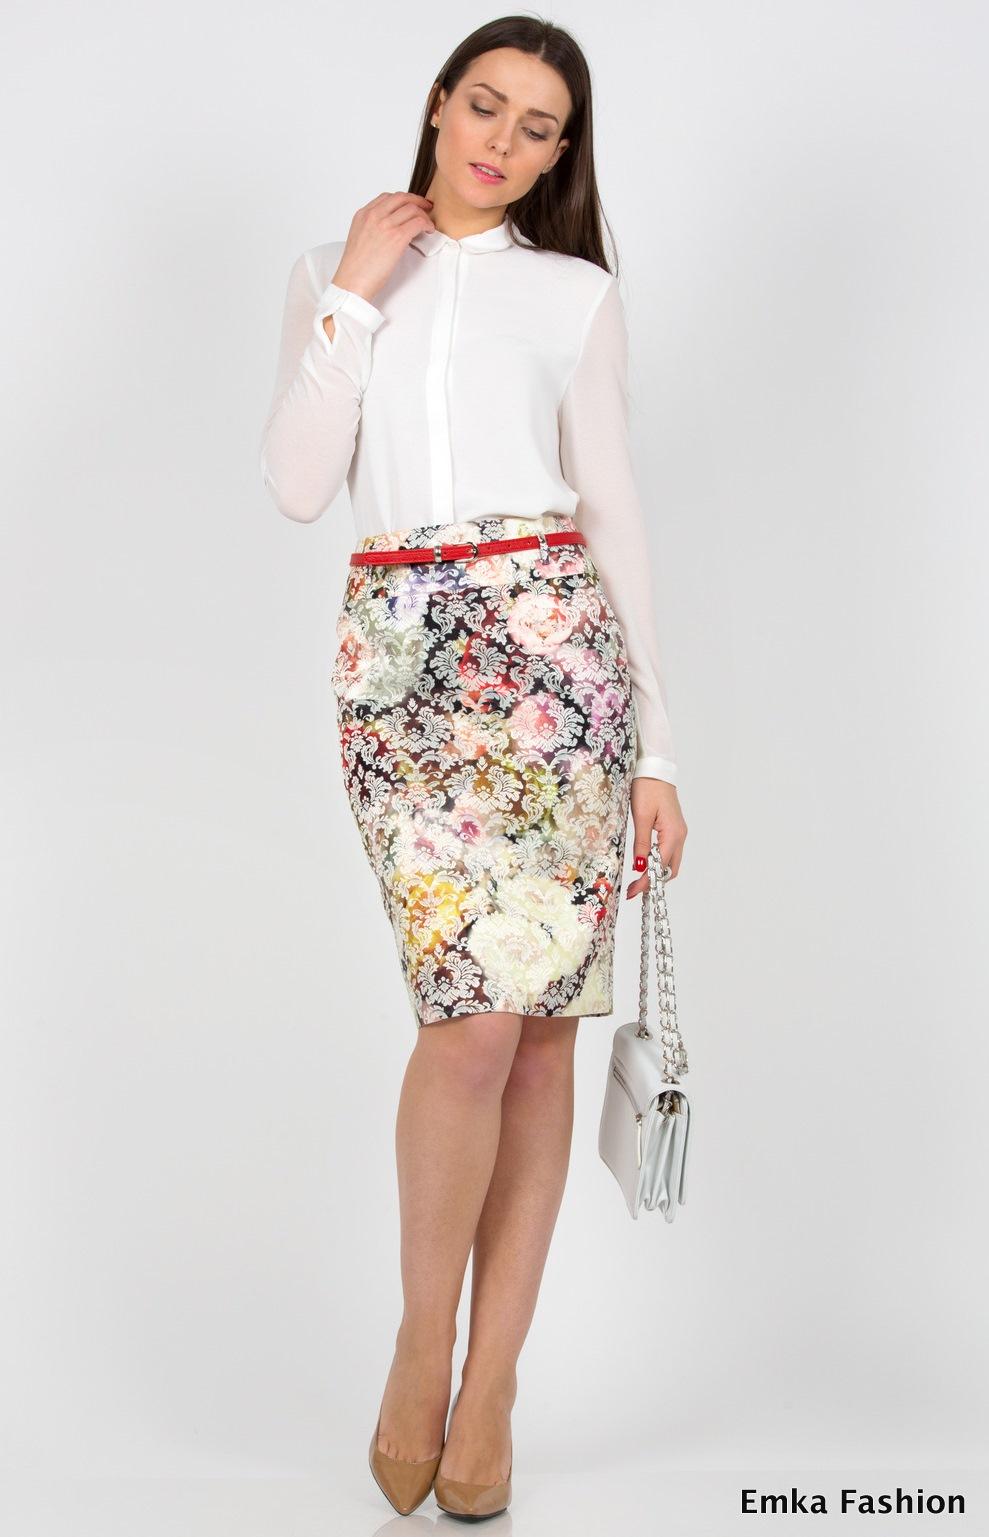 547eb0750c4 Юбка до колена Emka Fashion 202-tanya - Malinka-fashion.ru